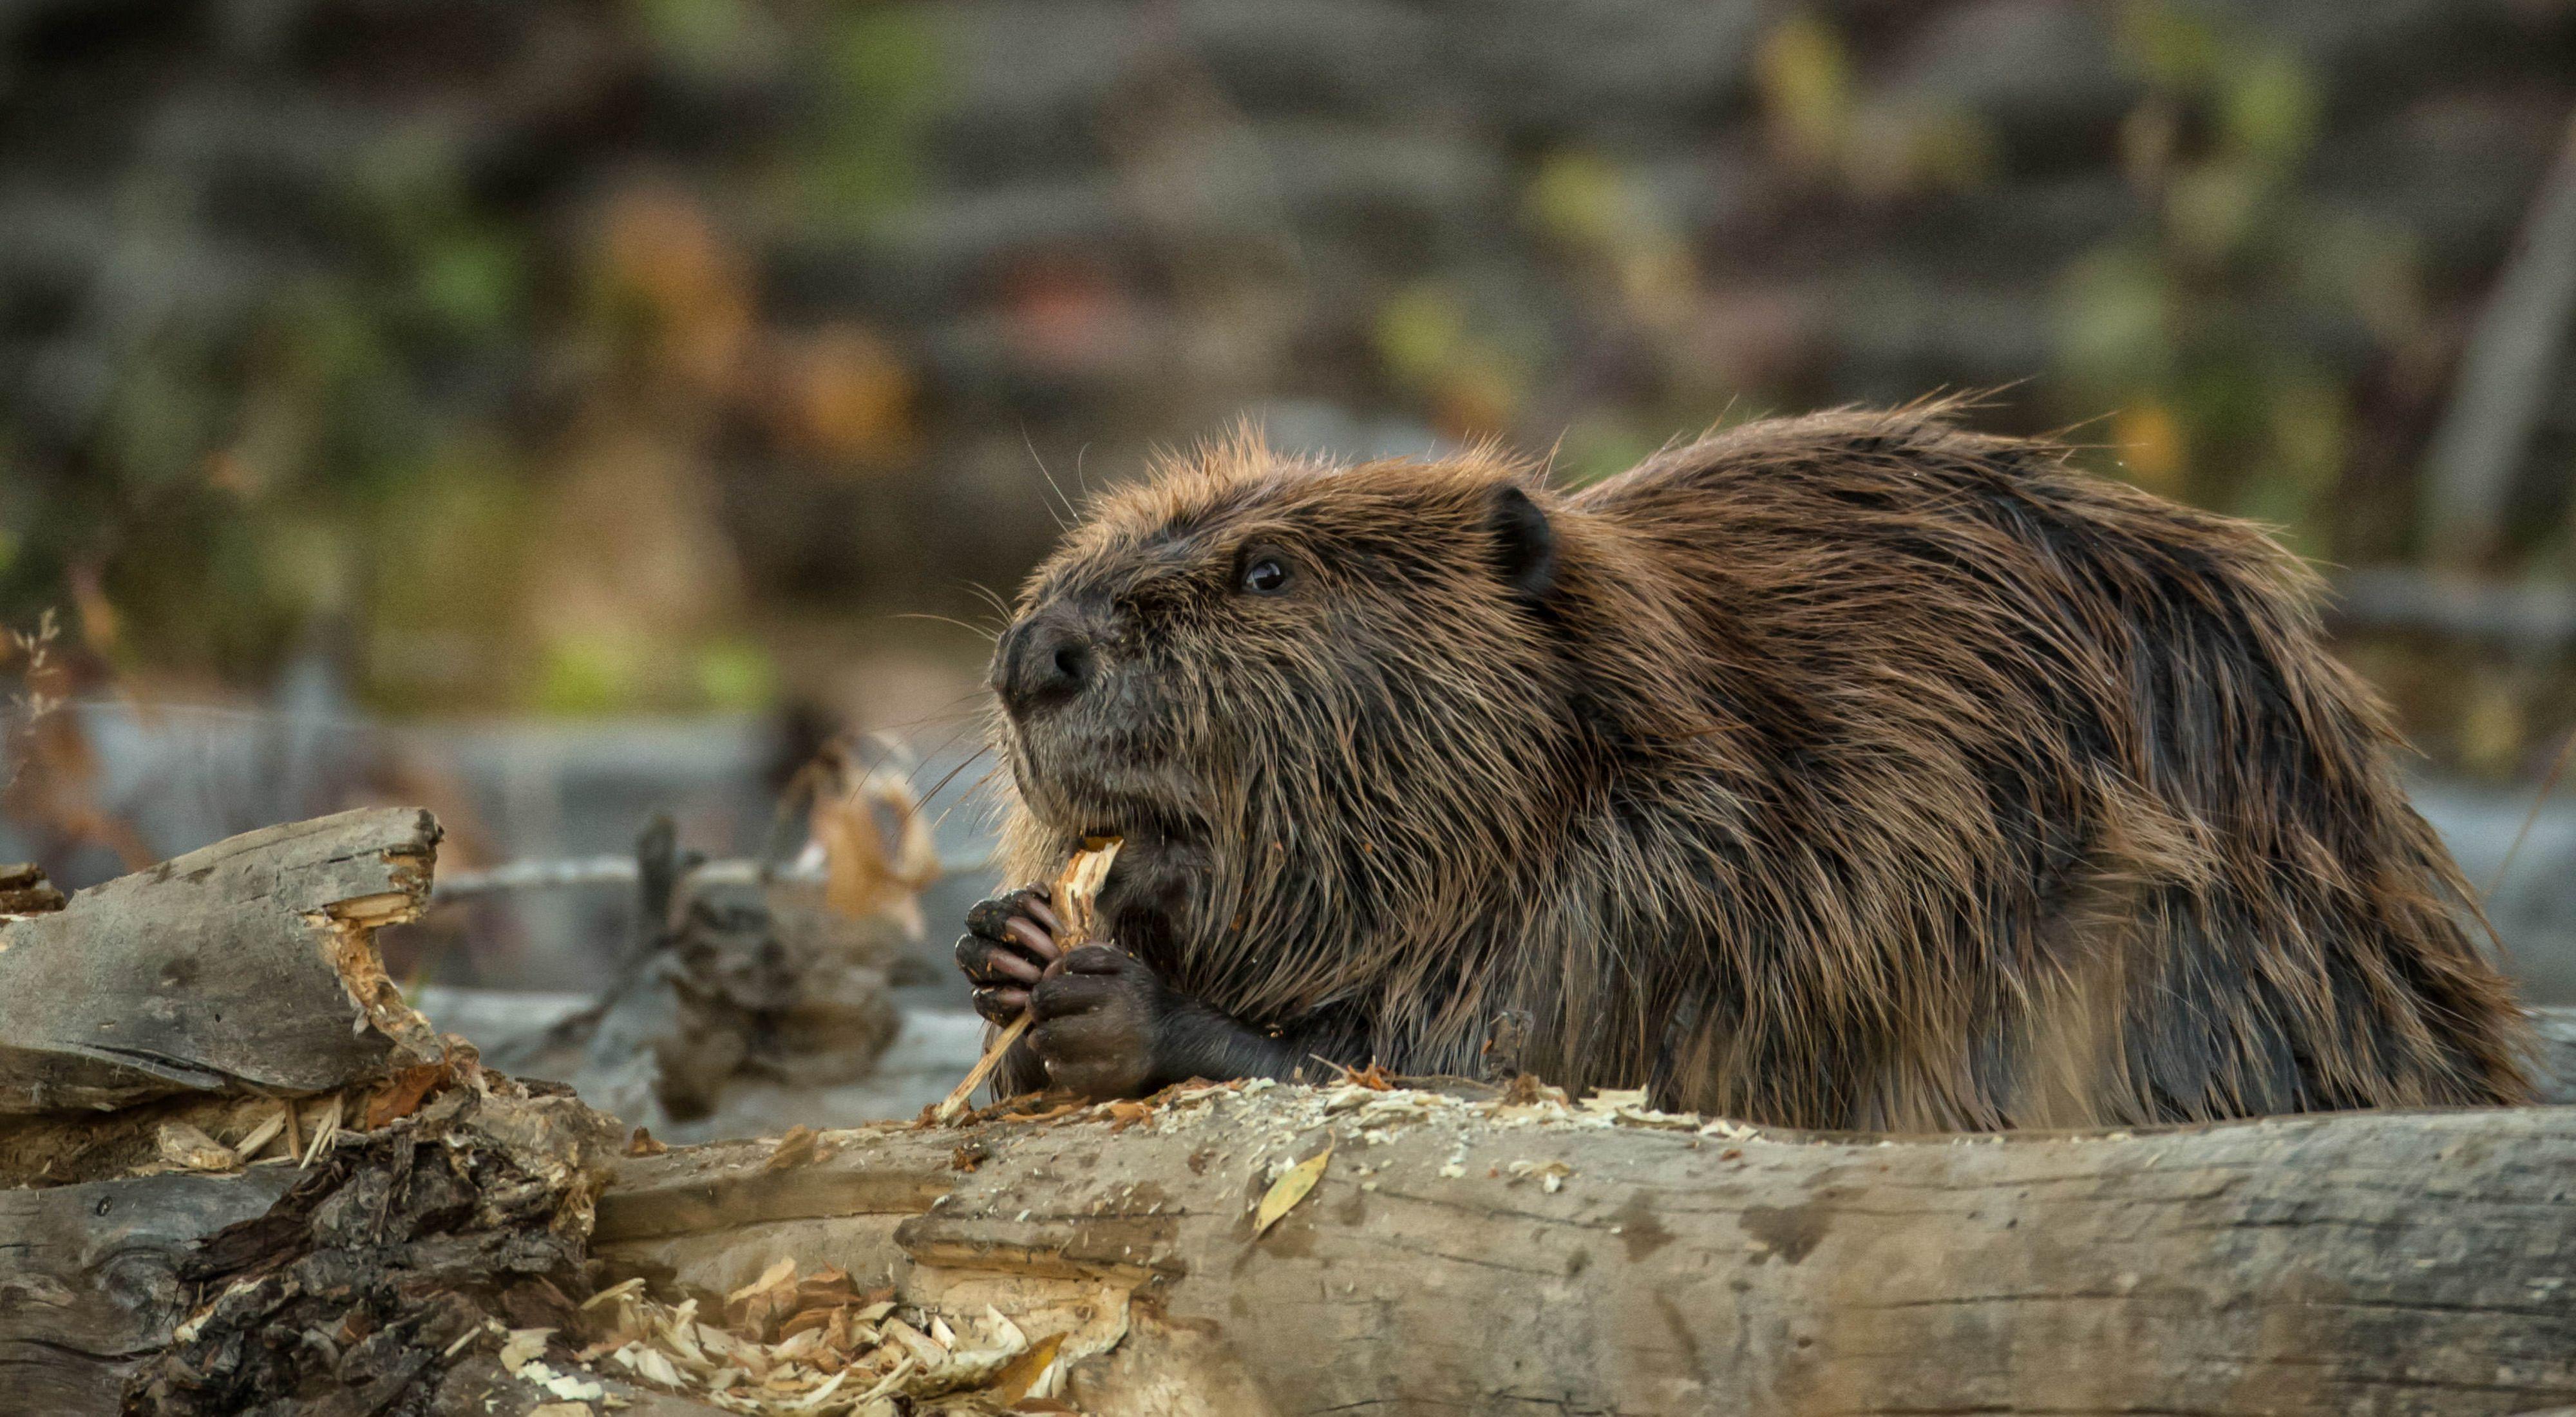 Beaver Mimicry 640 x 400